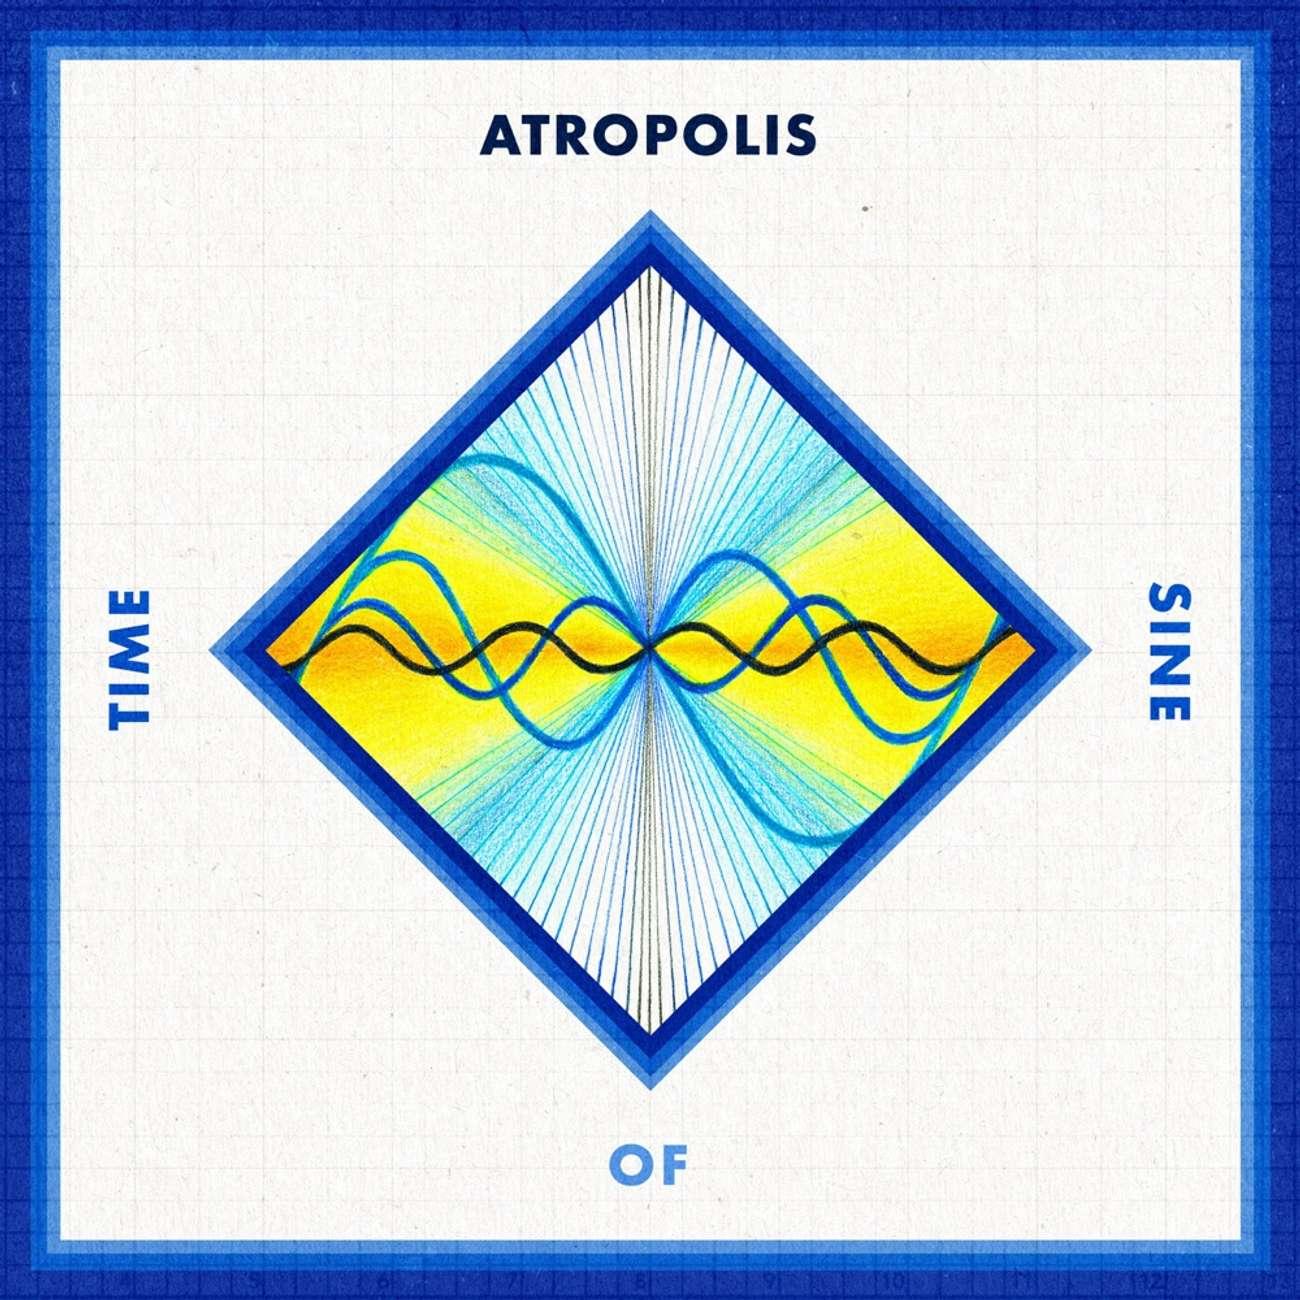 Time of Sine by Atropolis